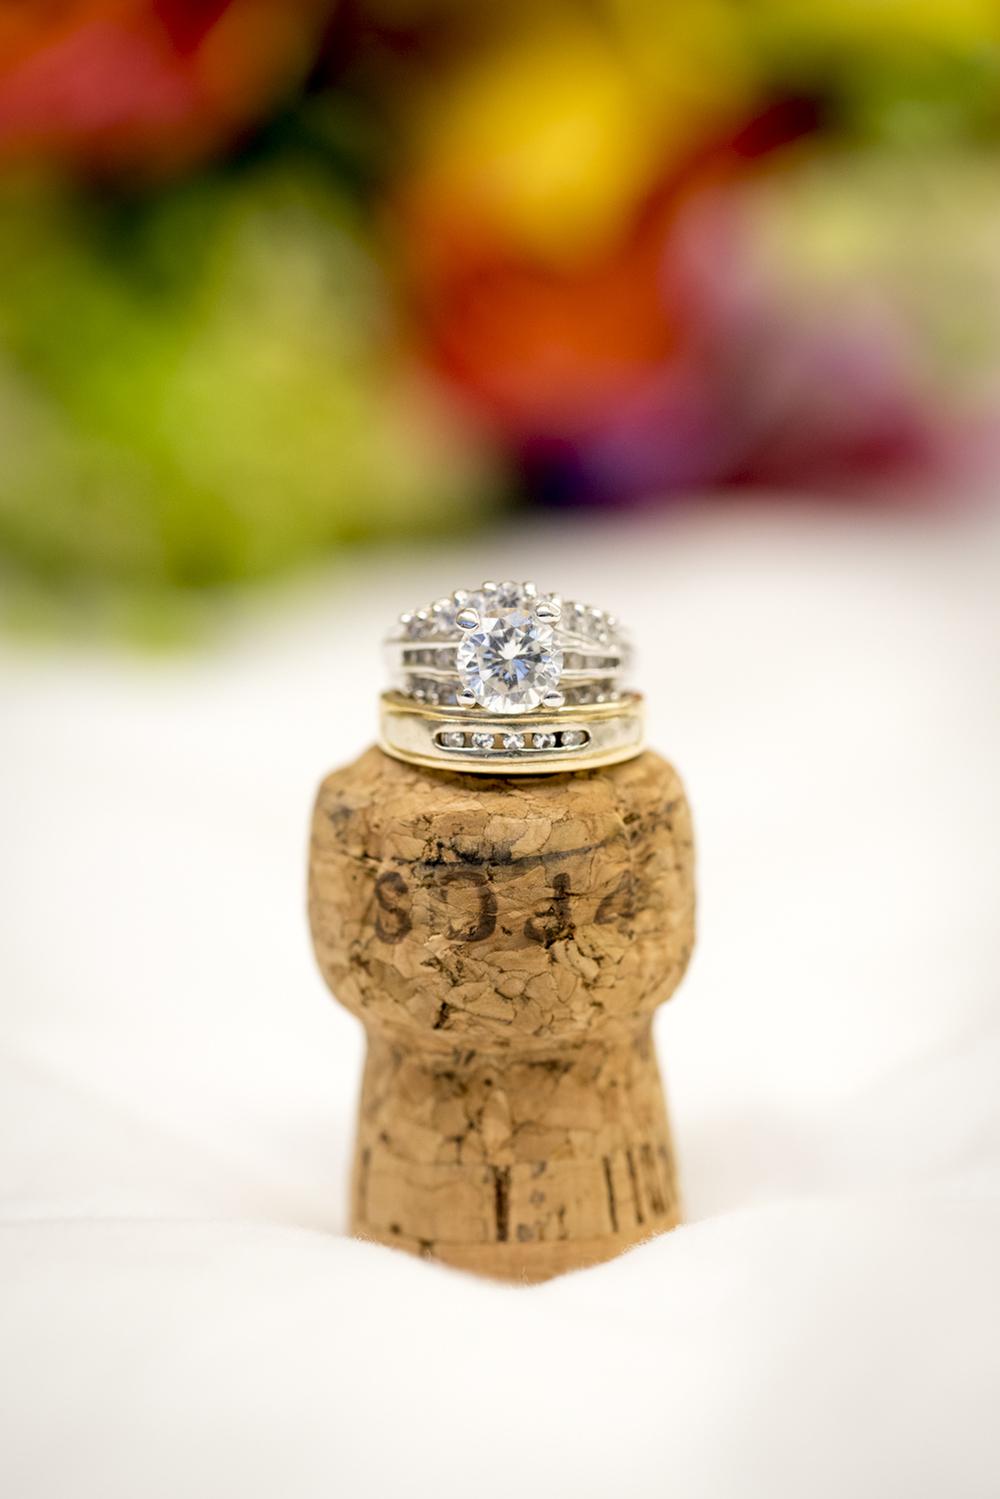 Rings_Champagne_Cork_SGroff